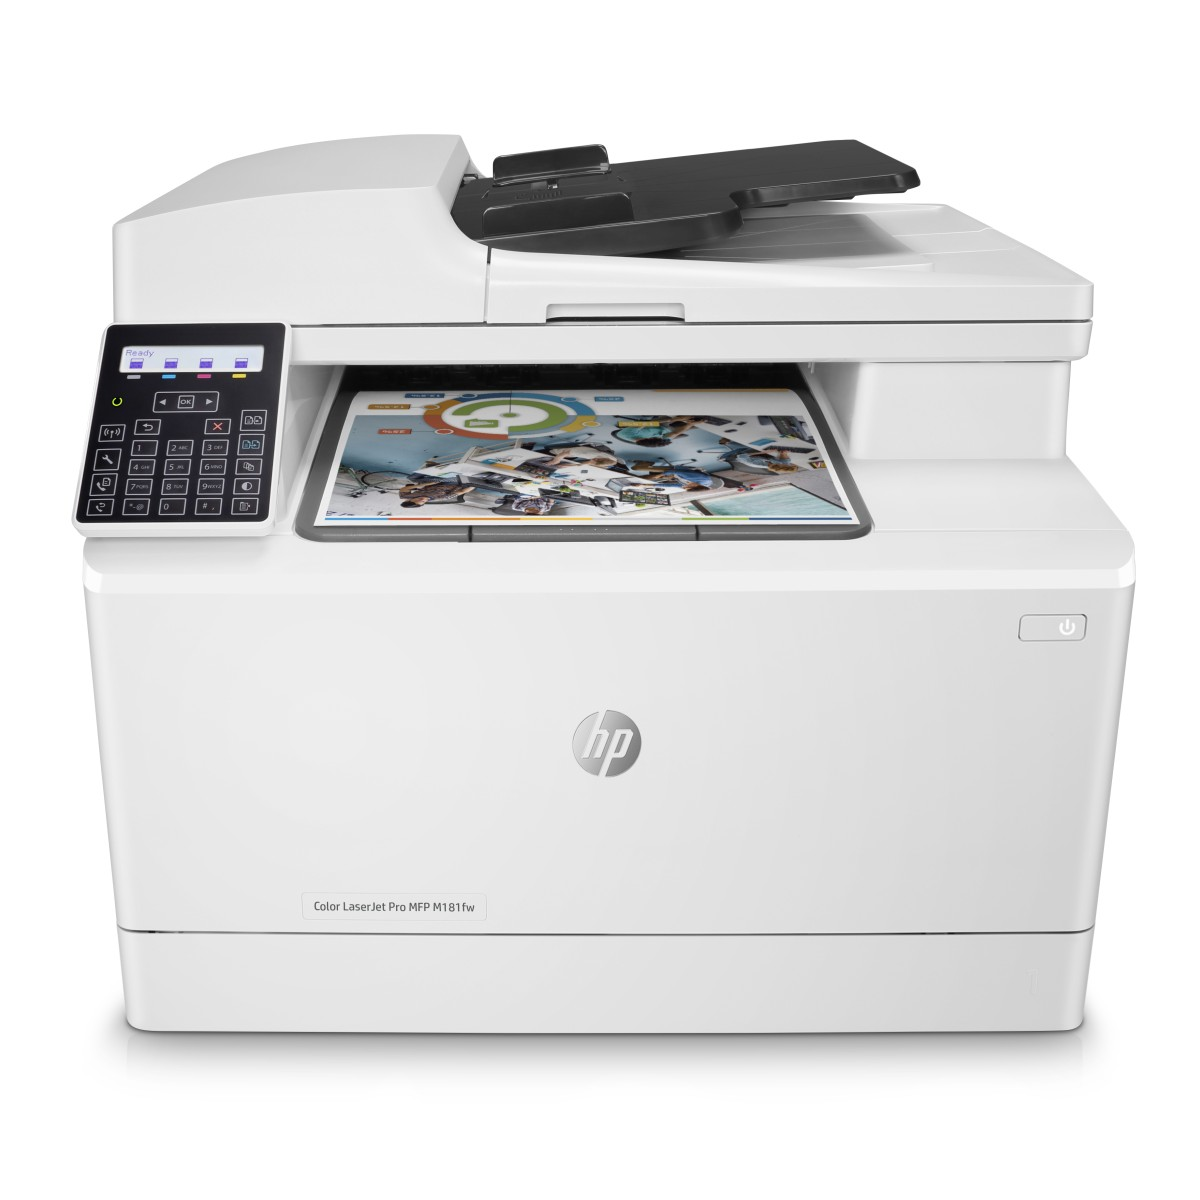 HP Color LaserJet Pro MFP M 181 fw